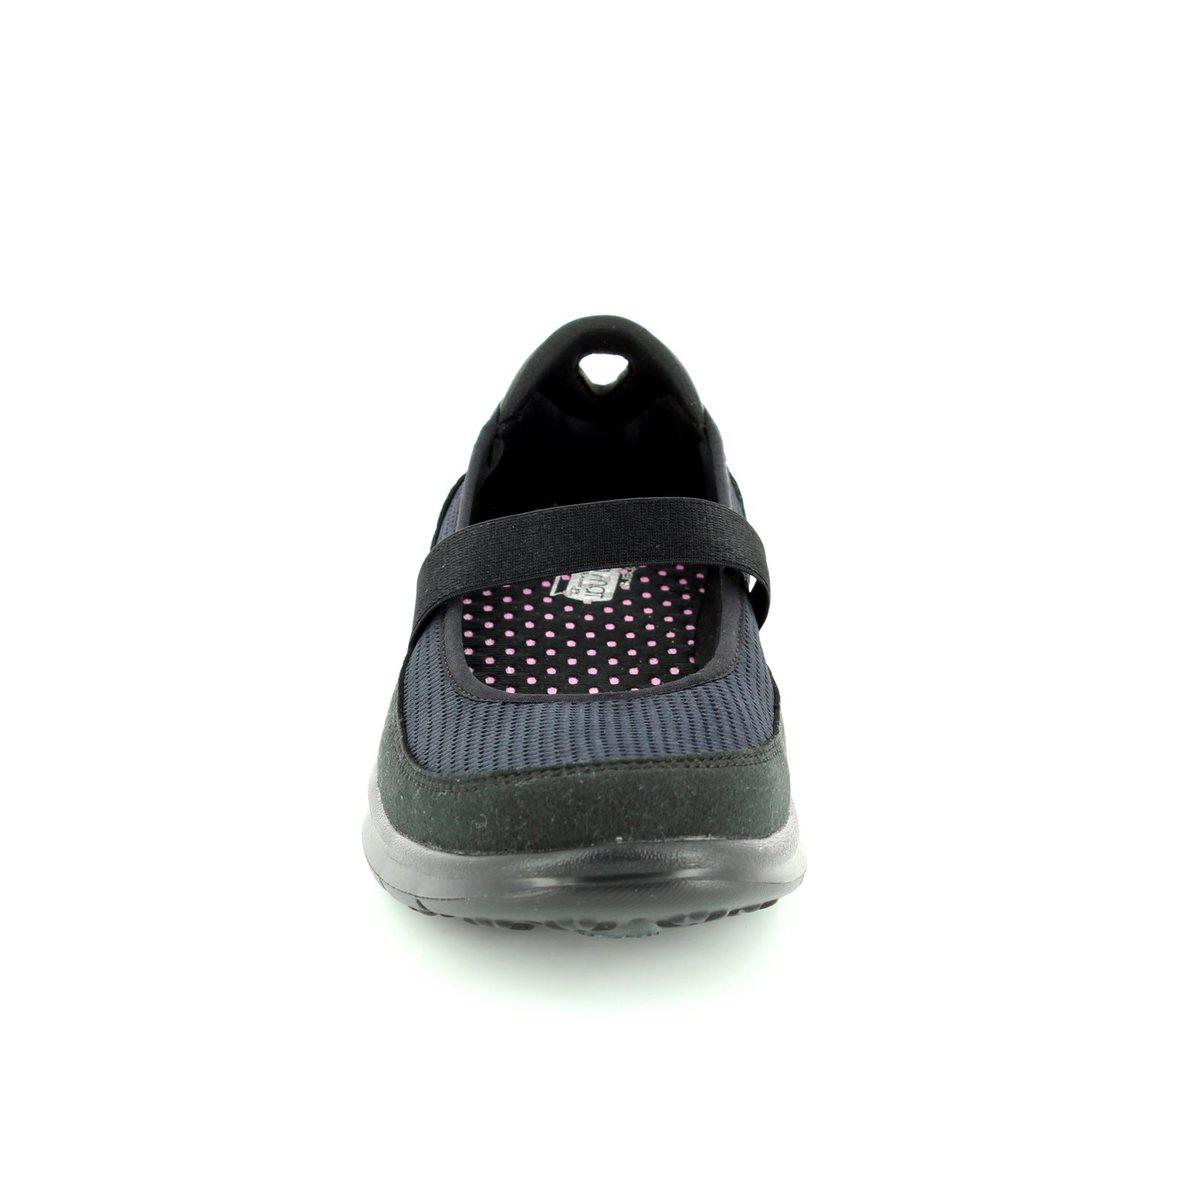 Skechers Trainers - Black - 14213 GO STEP BAR